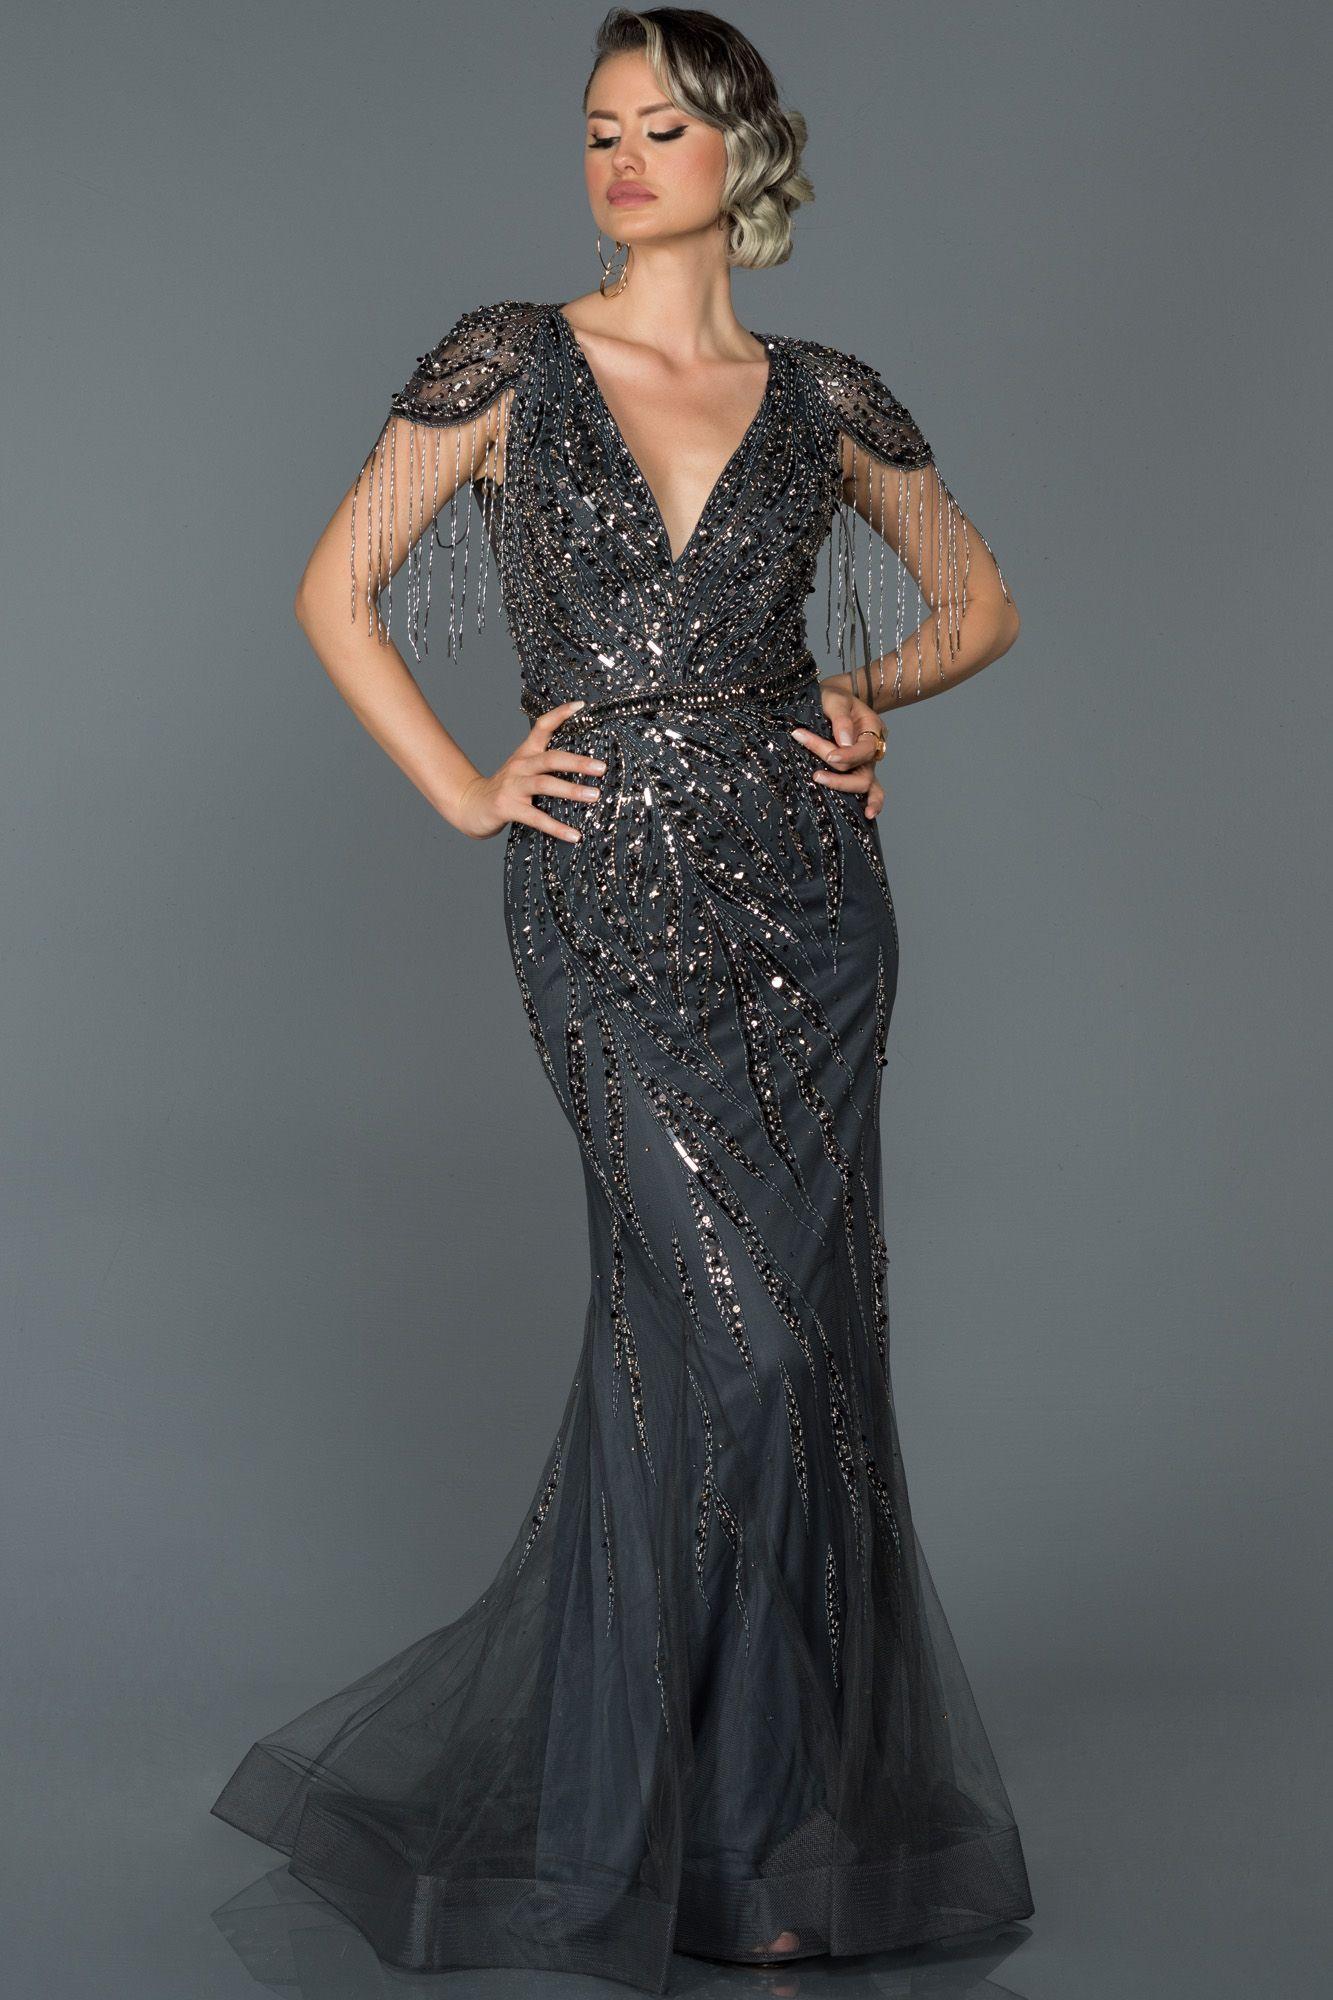 Antrasit Sik Tas Islemeli V Yaka Ozel Tasarim Abiye Abu156 2020 Elbise The Dress Elbise Modelleri